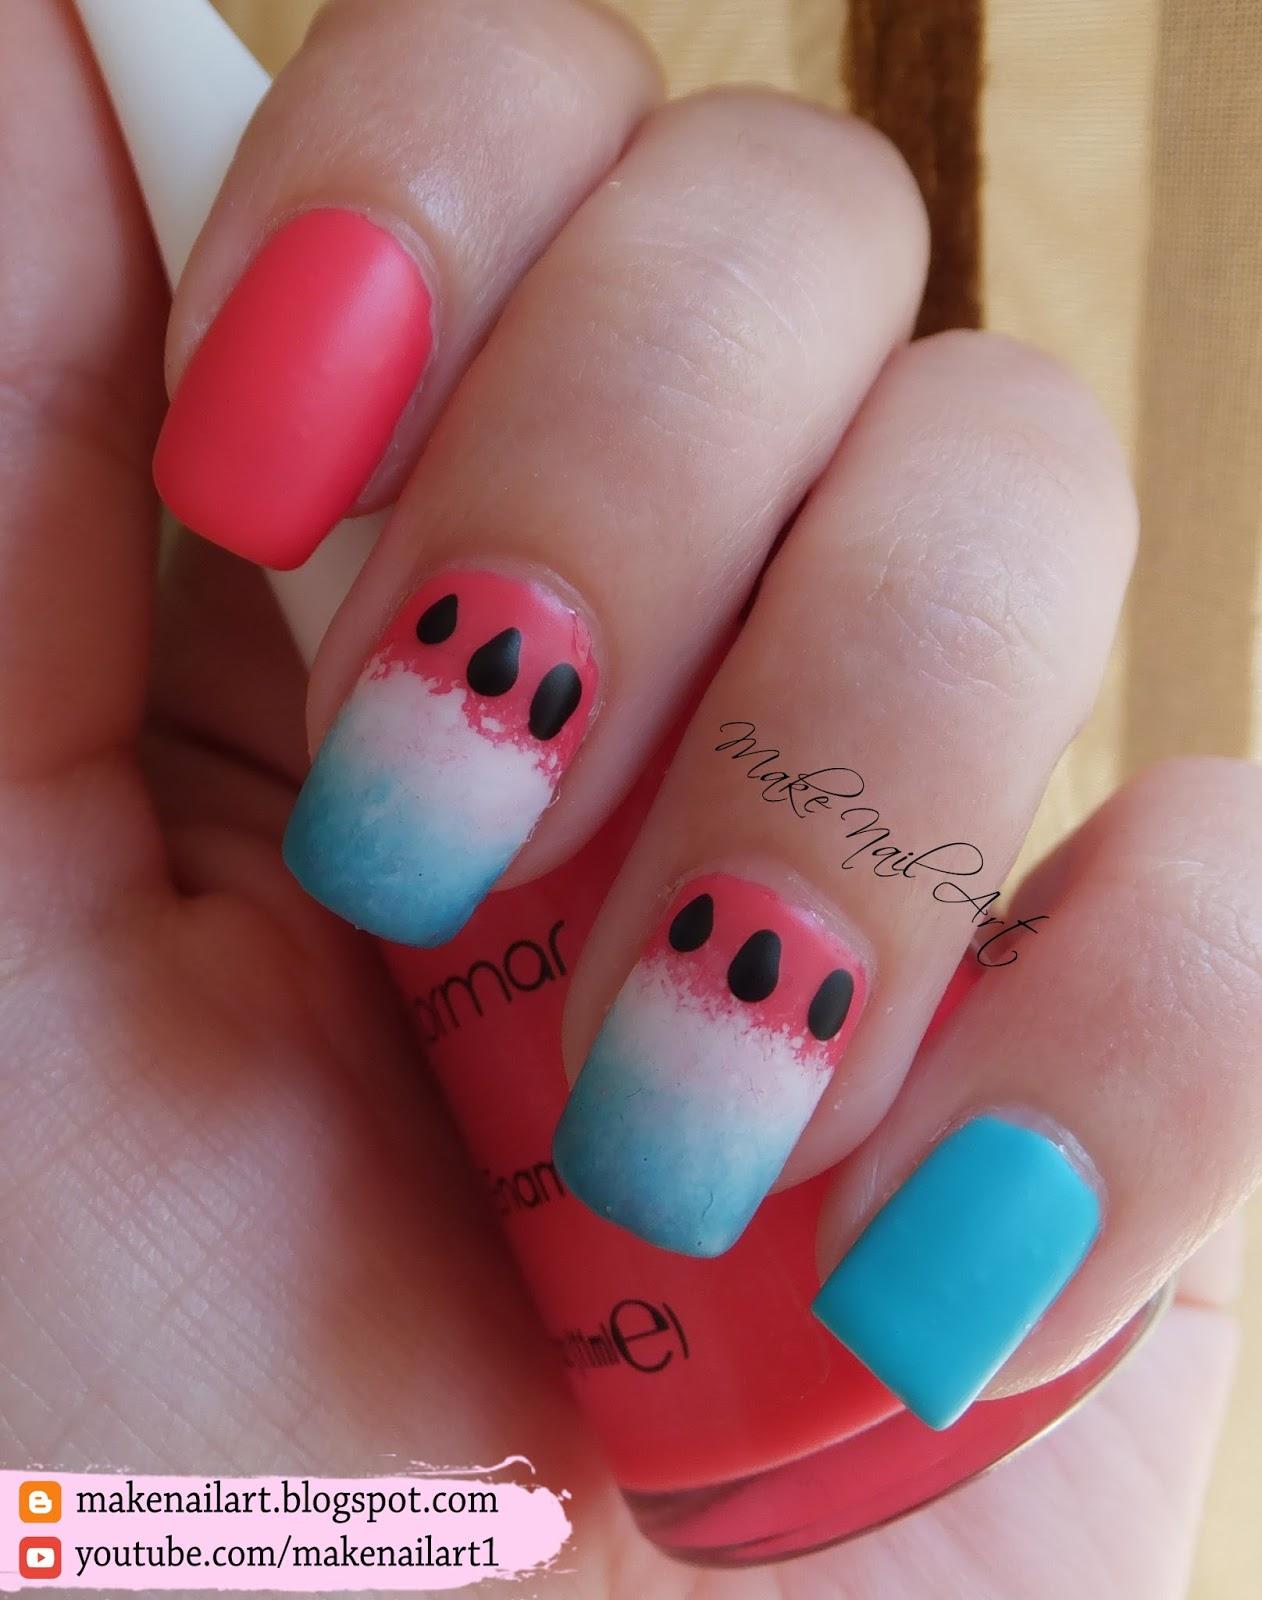 Make Nail Art Watermelon Inspired Nail Art Design Tutorial